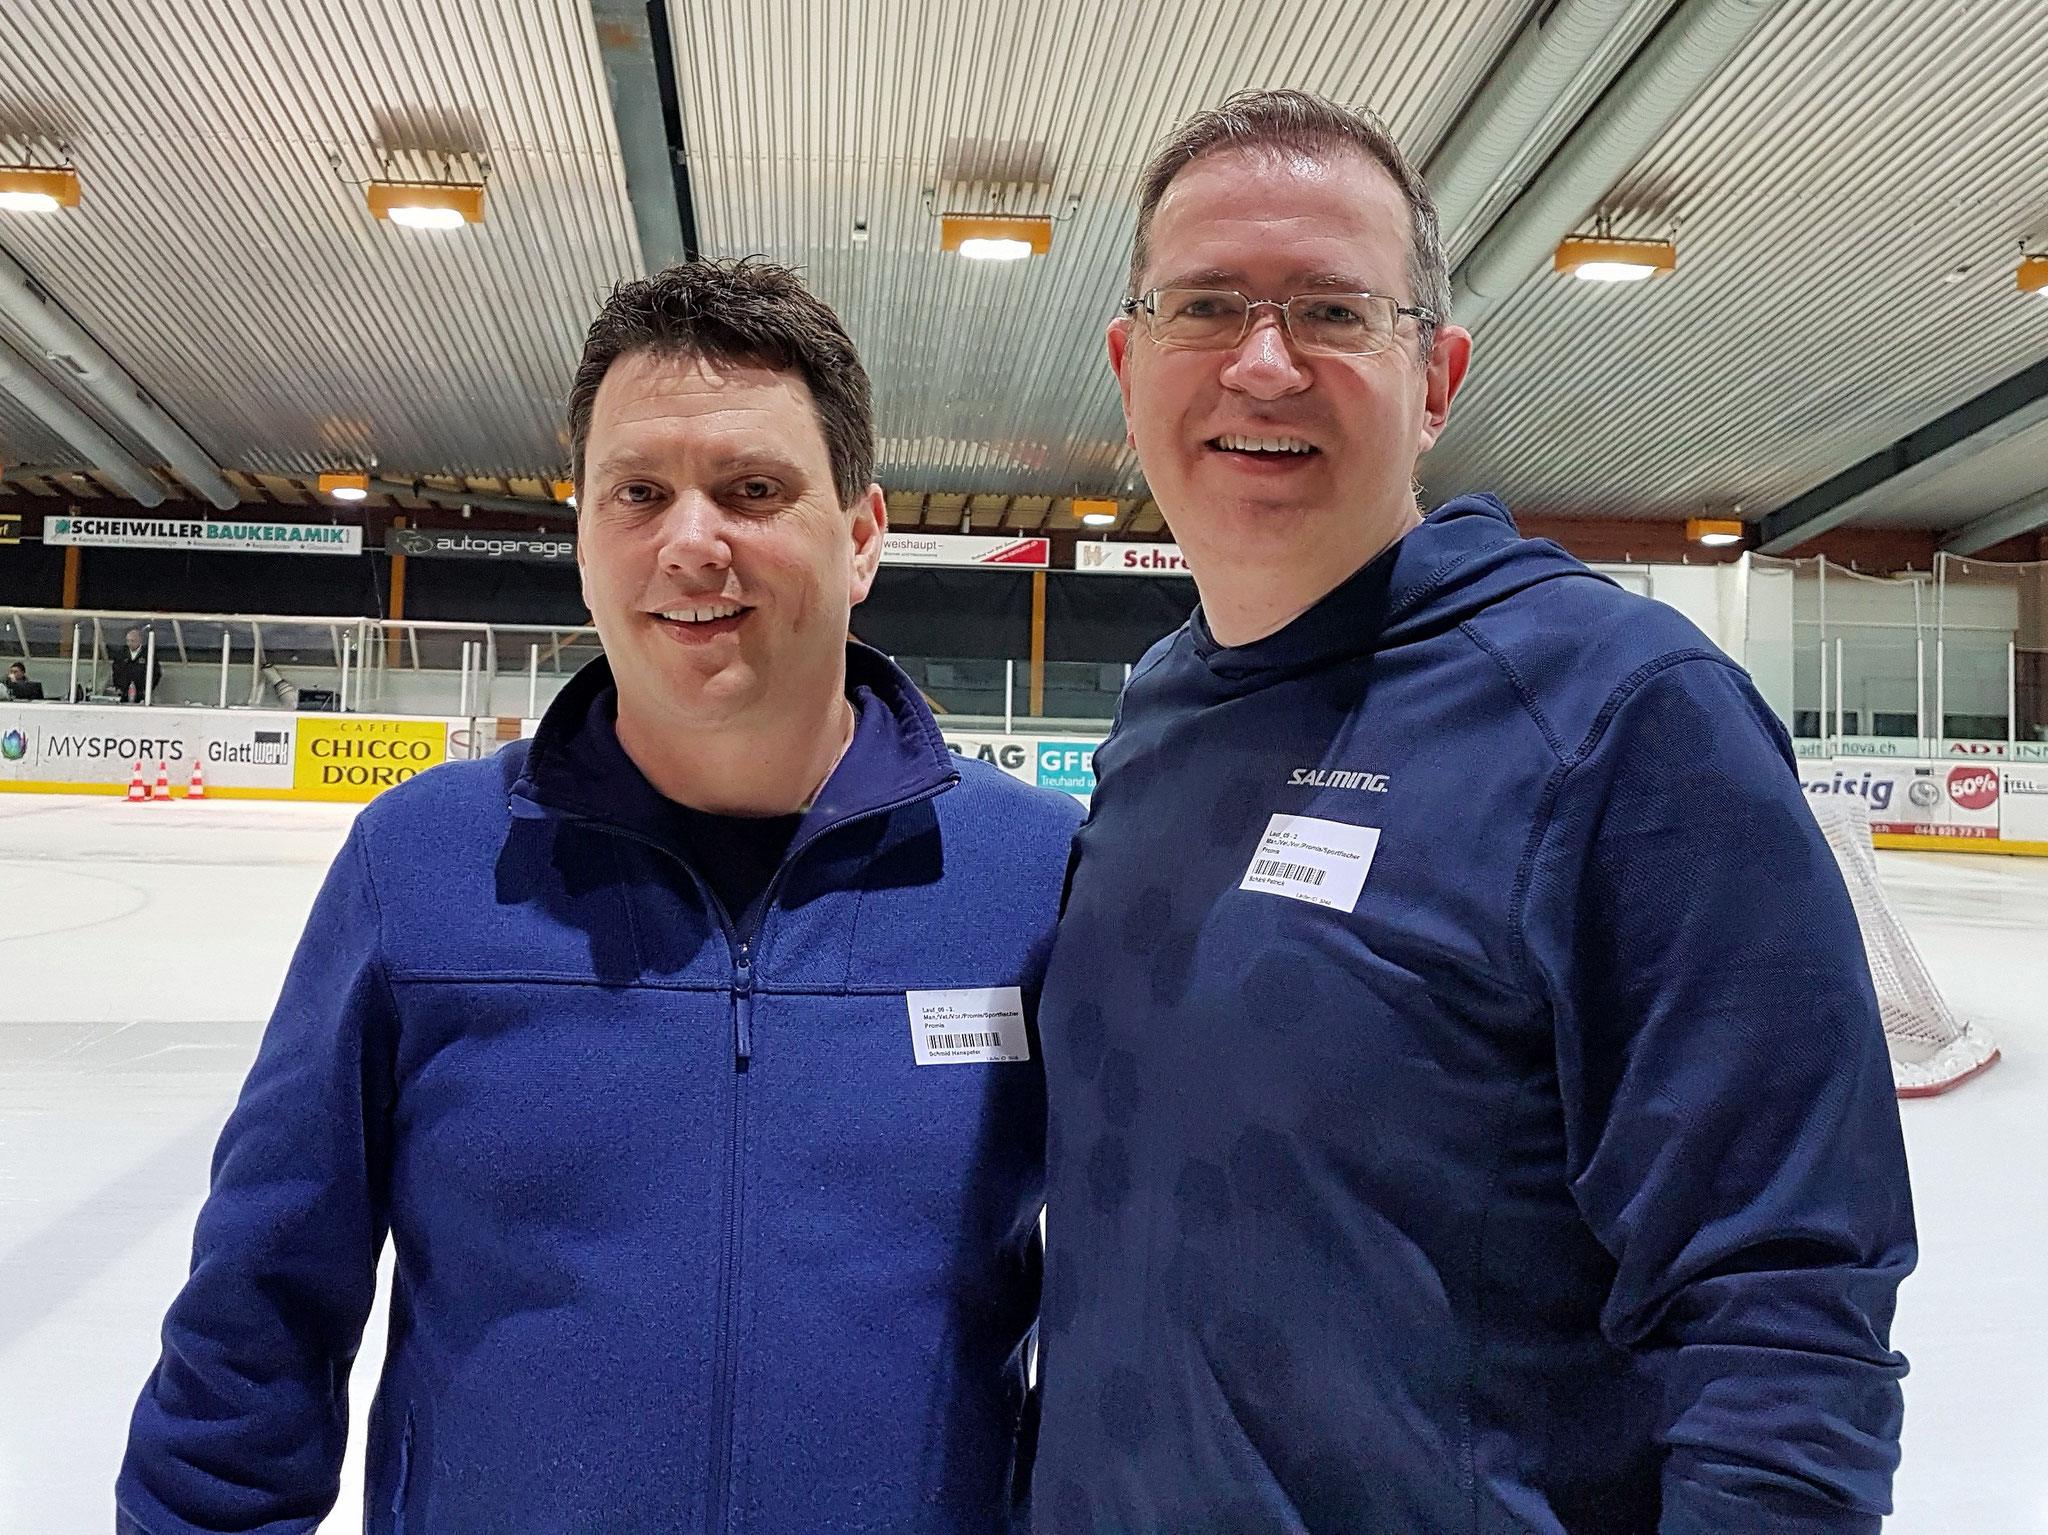 Skateathon 2018 EHC Dübendorf ¦ mit Patrick Schärli, Gemeinderat CVP, Januar 2018